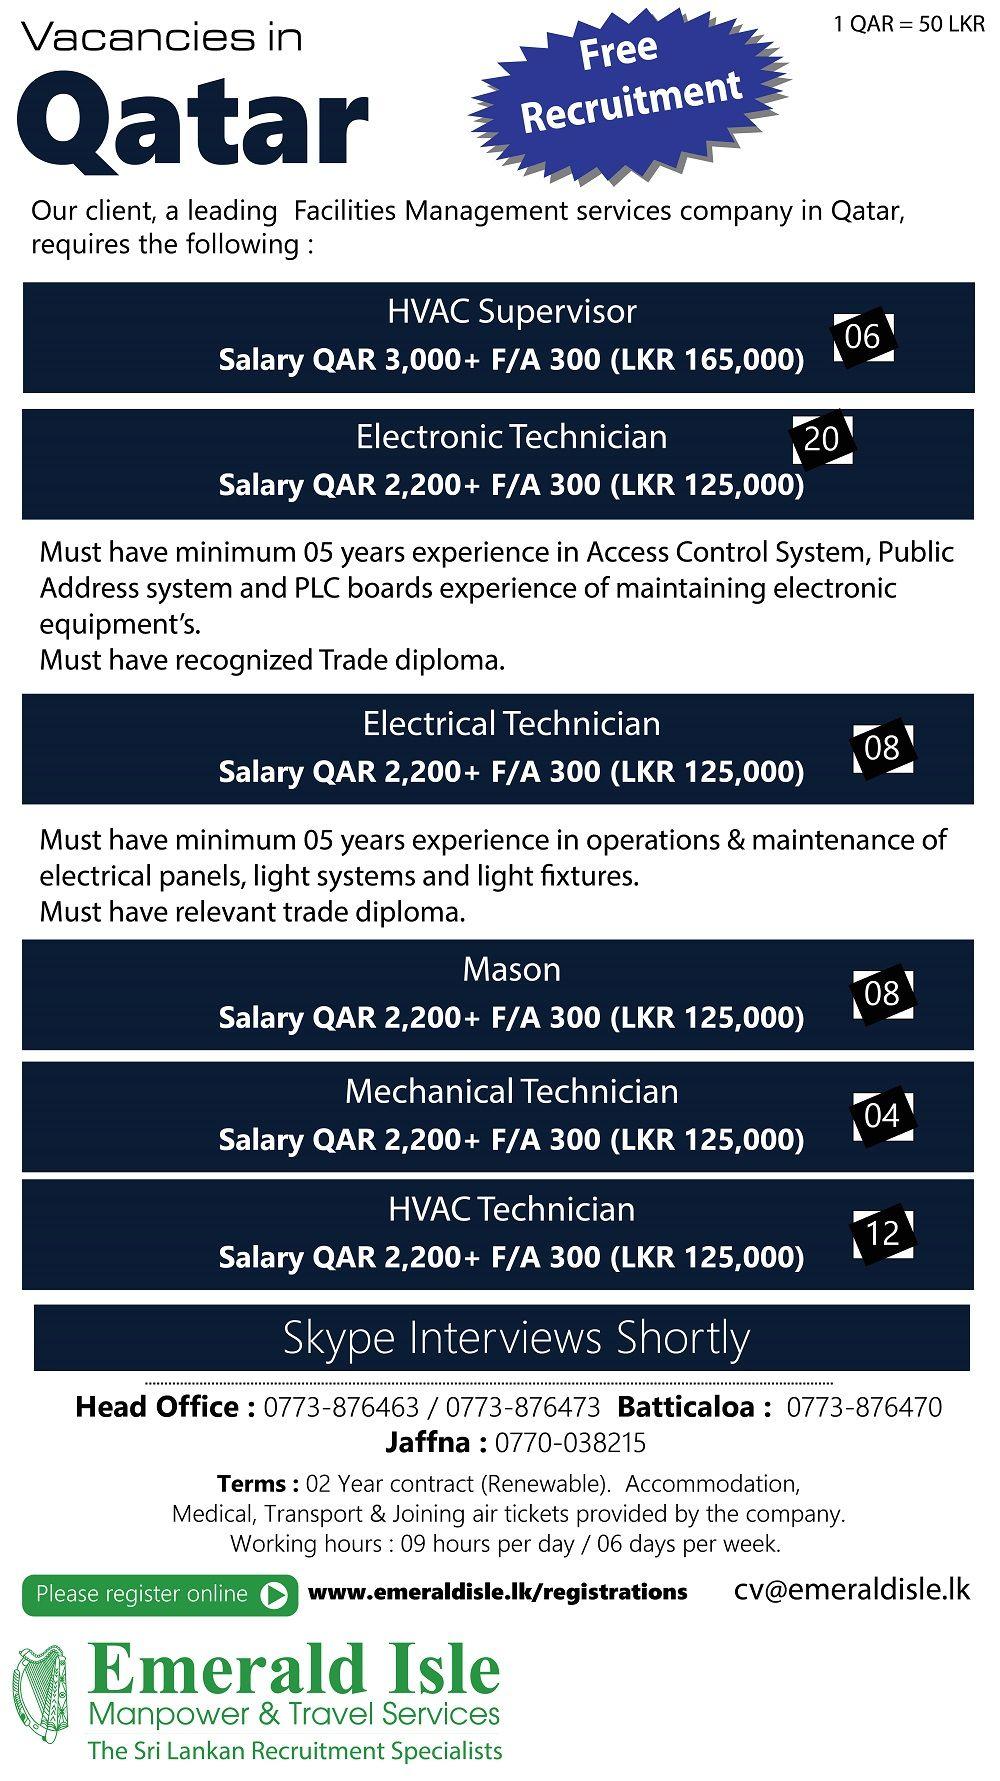 Foreign Vacancies Overseas Jobs Job Recruitment